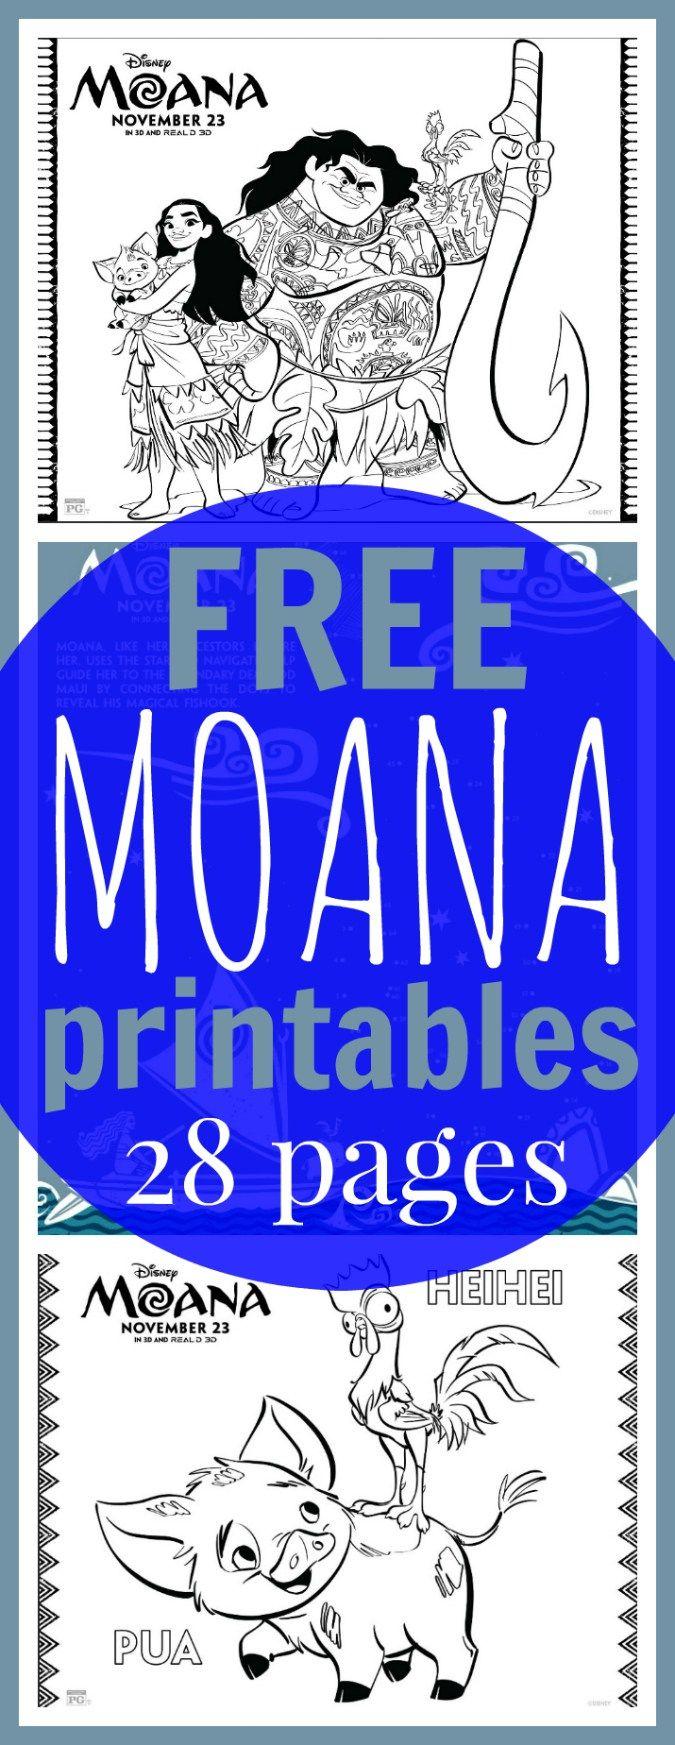 FREE Printable Moana Coloring Sheets + Kids Activities #Moana - Raising Whasians